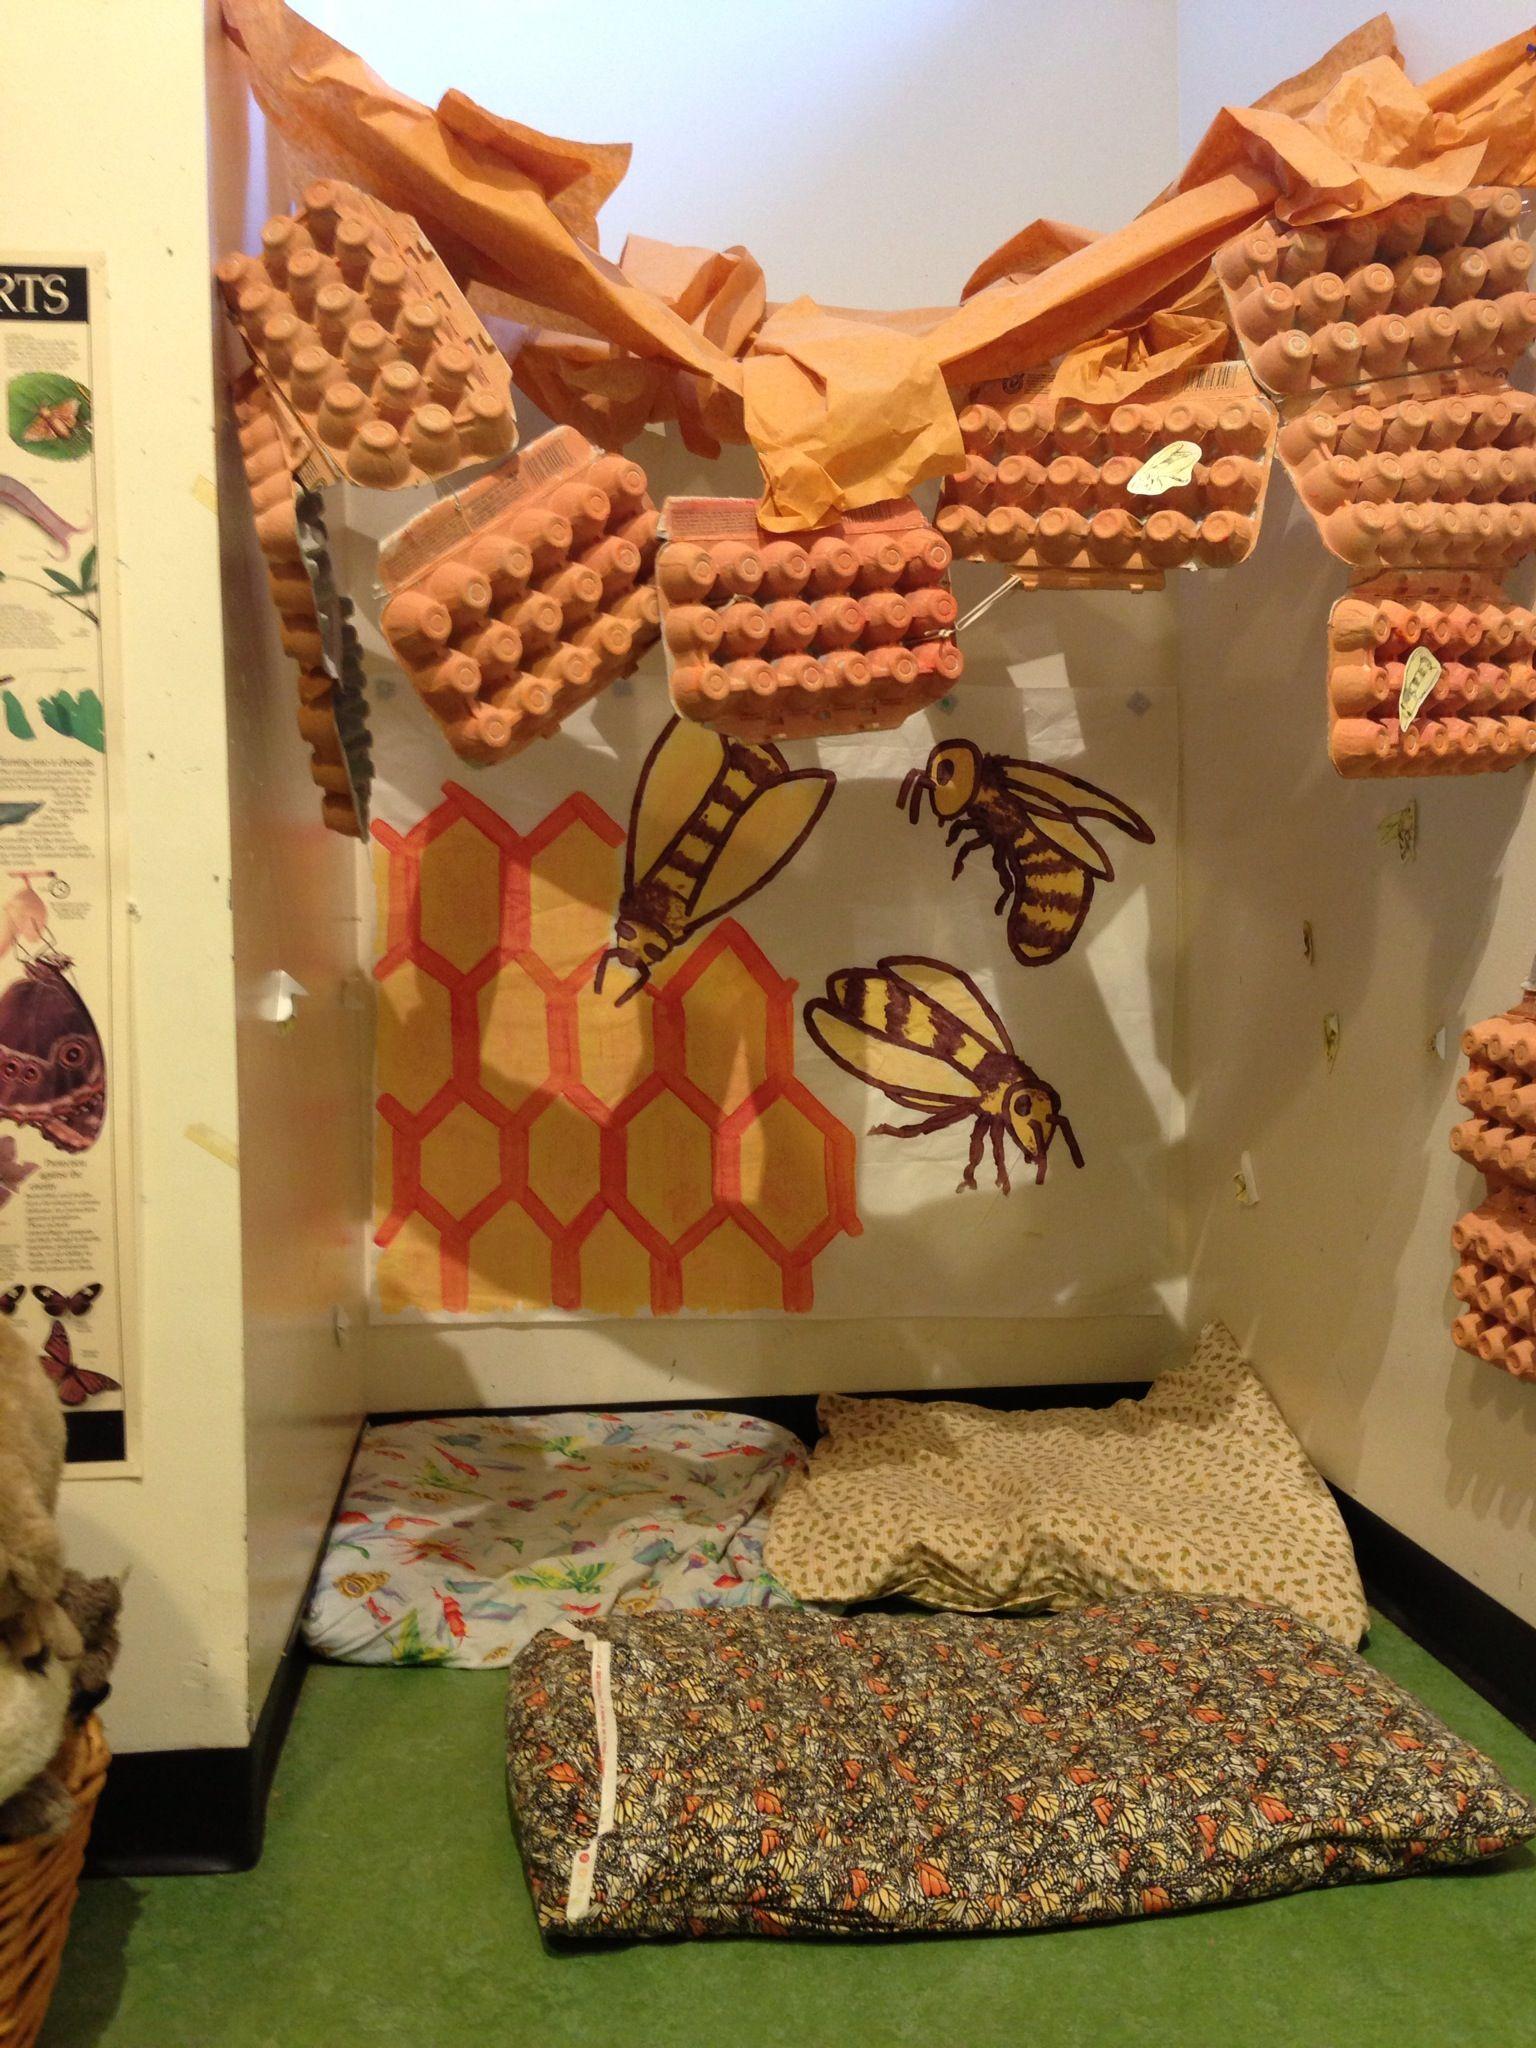 Bee Hive Imaginary Play Corner In Preschool Room At